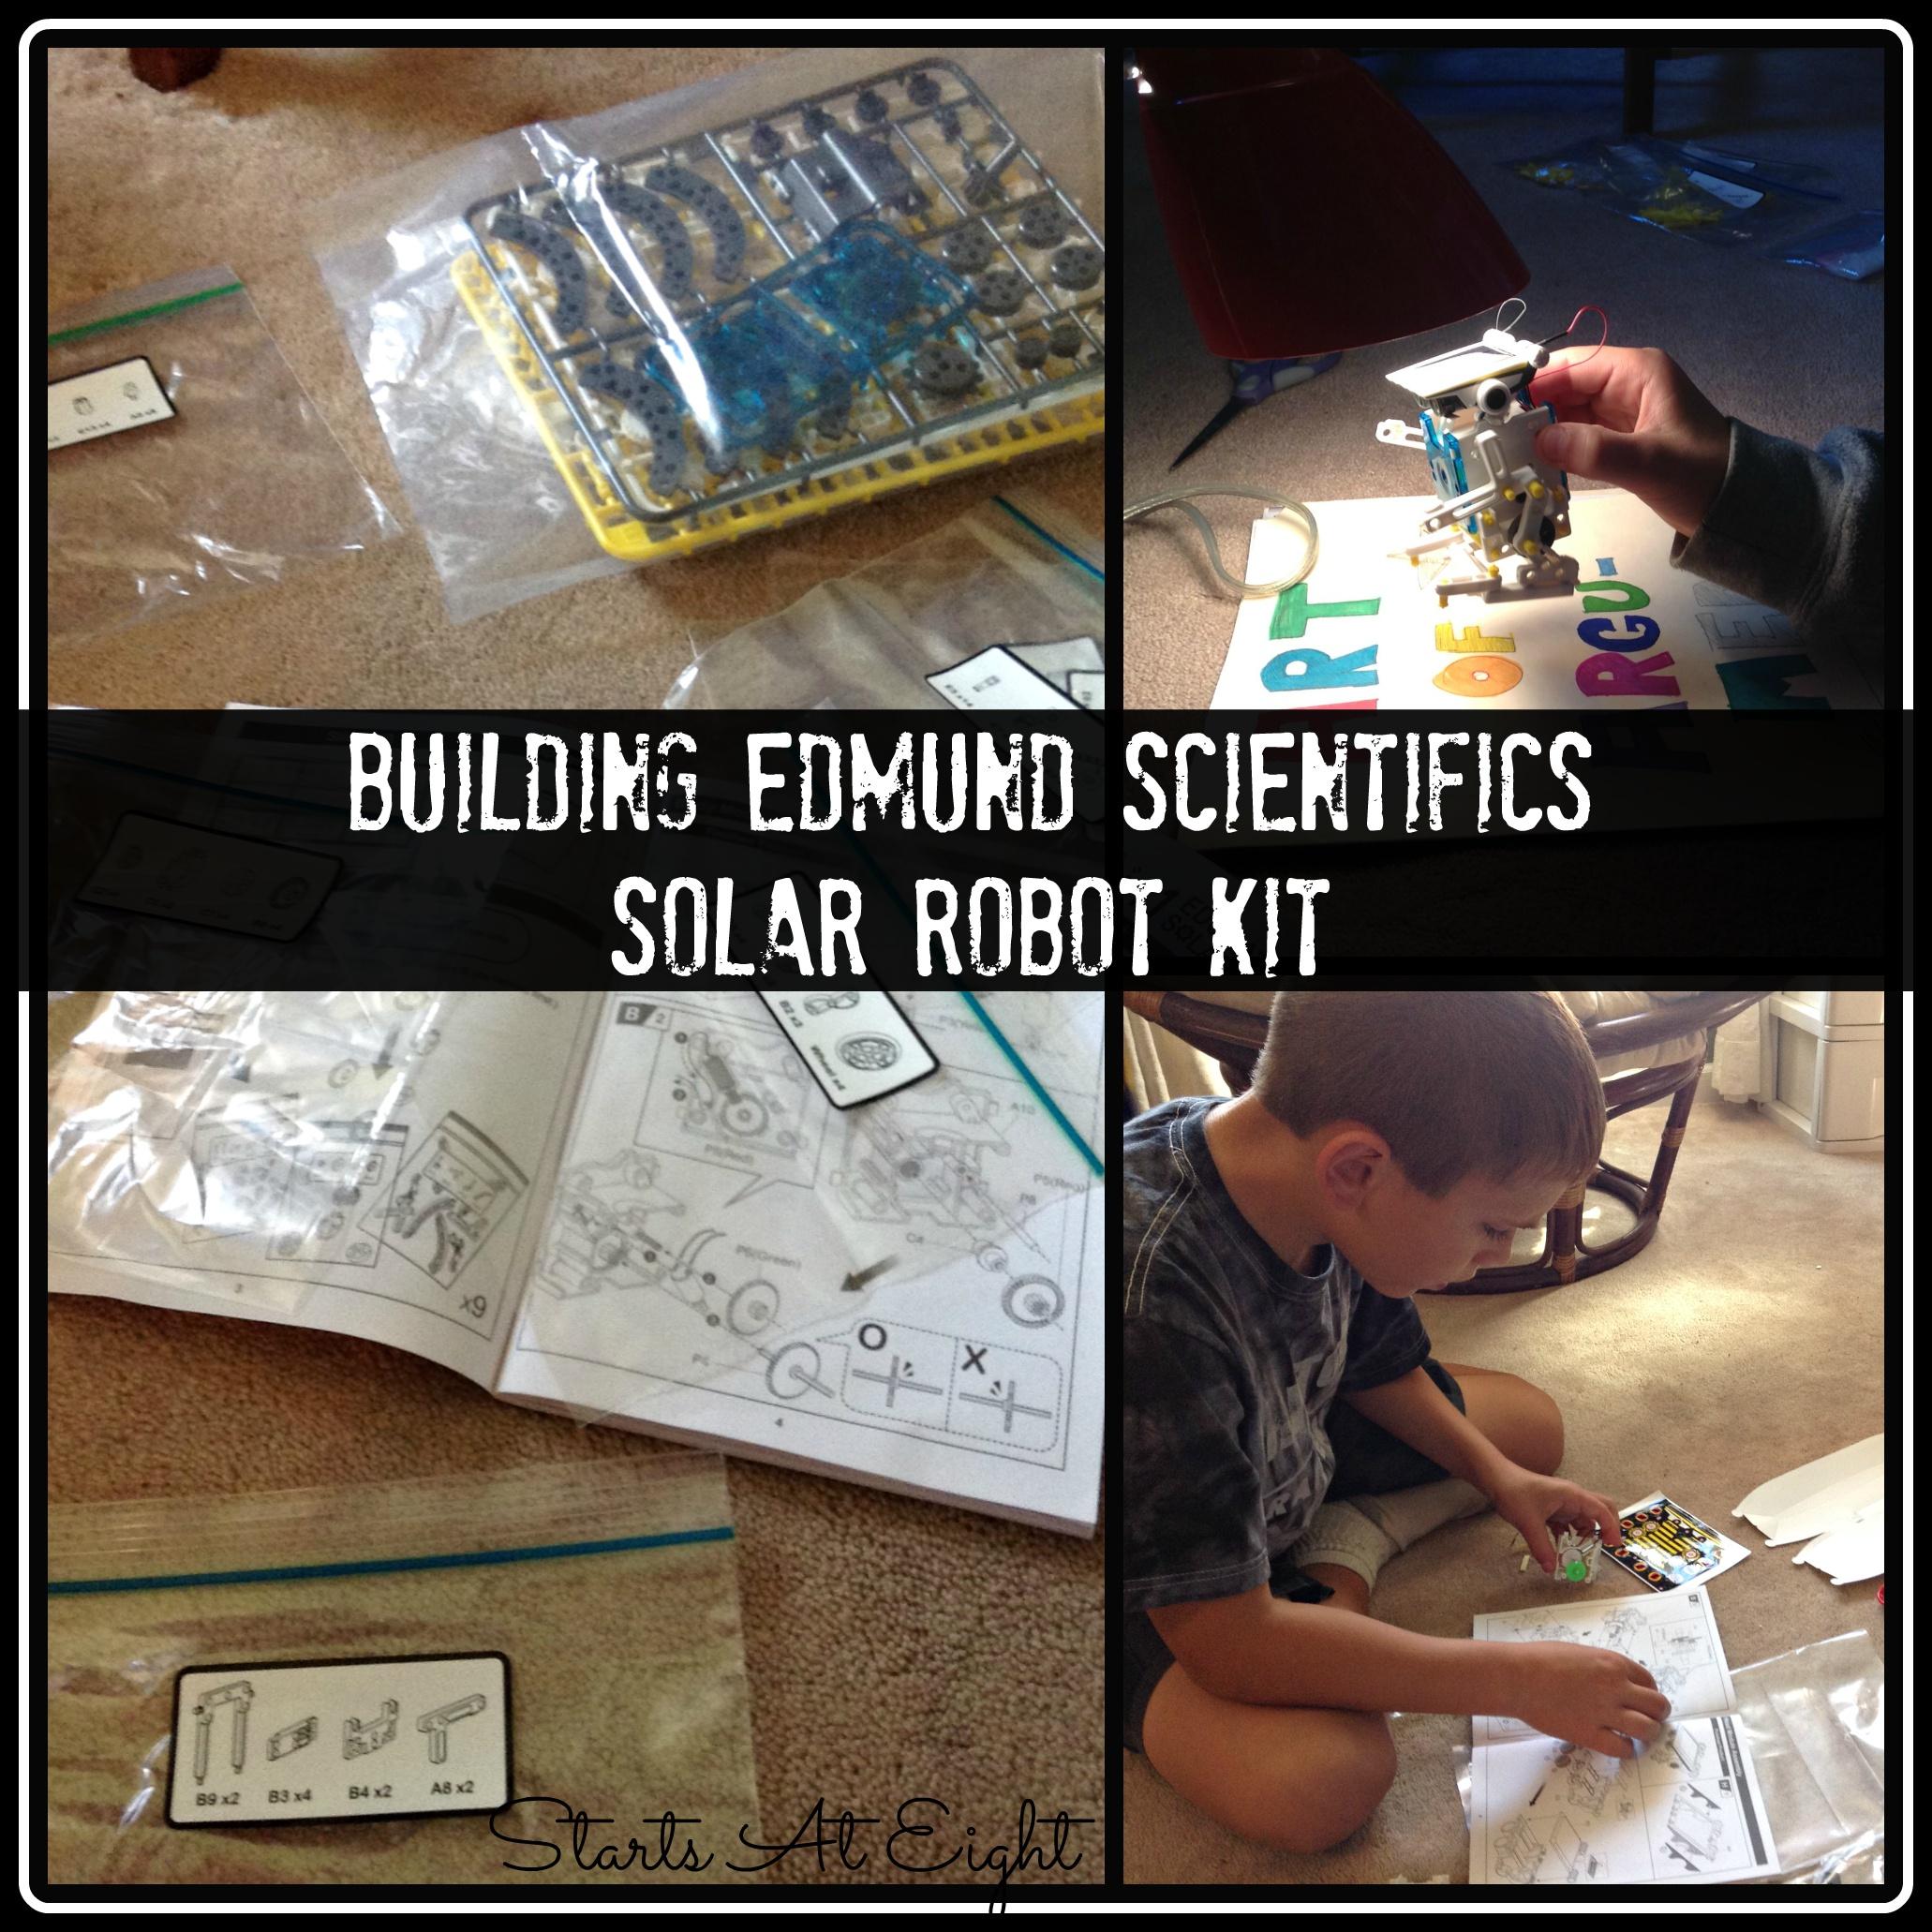 Building Edmund Scientifics Solar Robot Kit